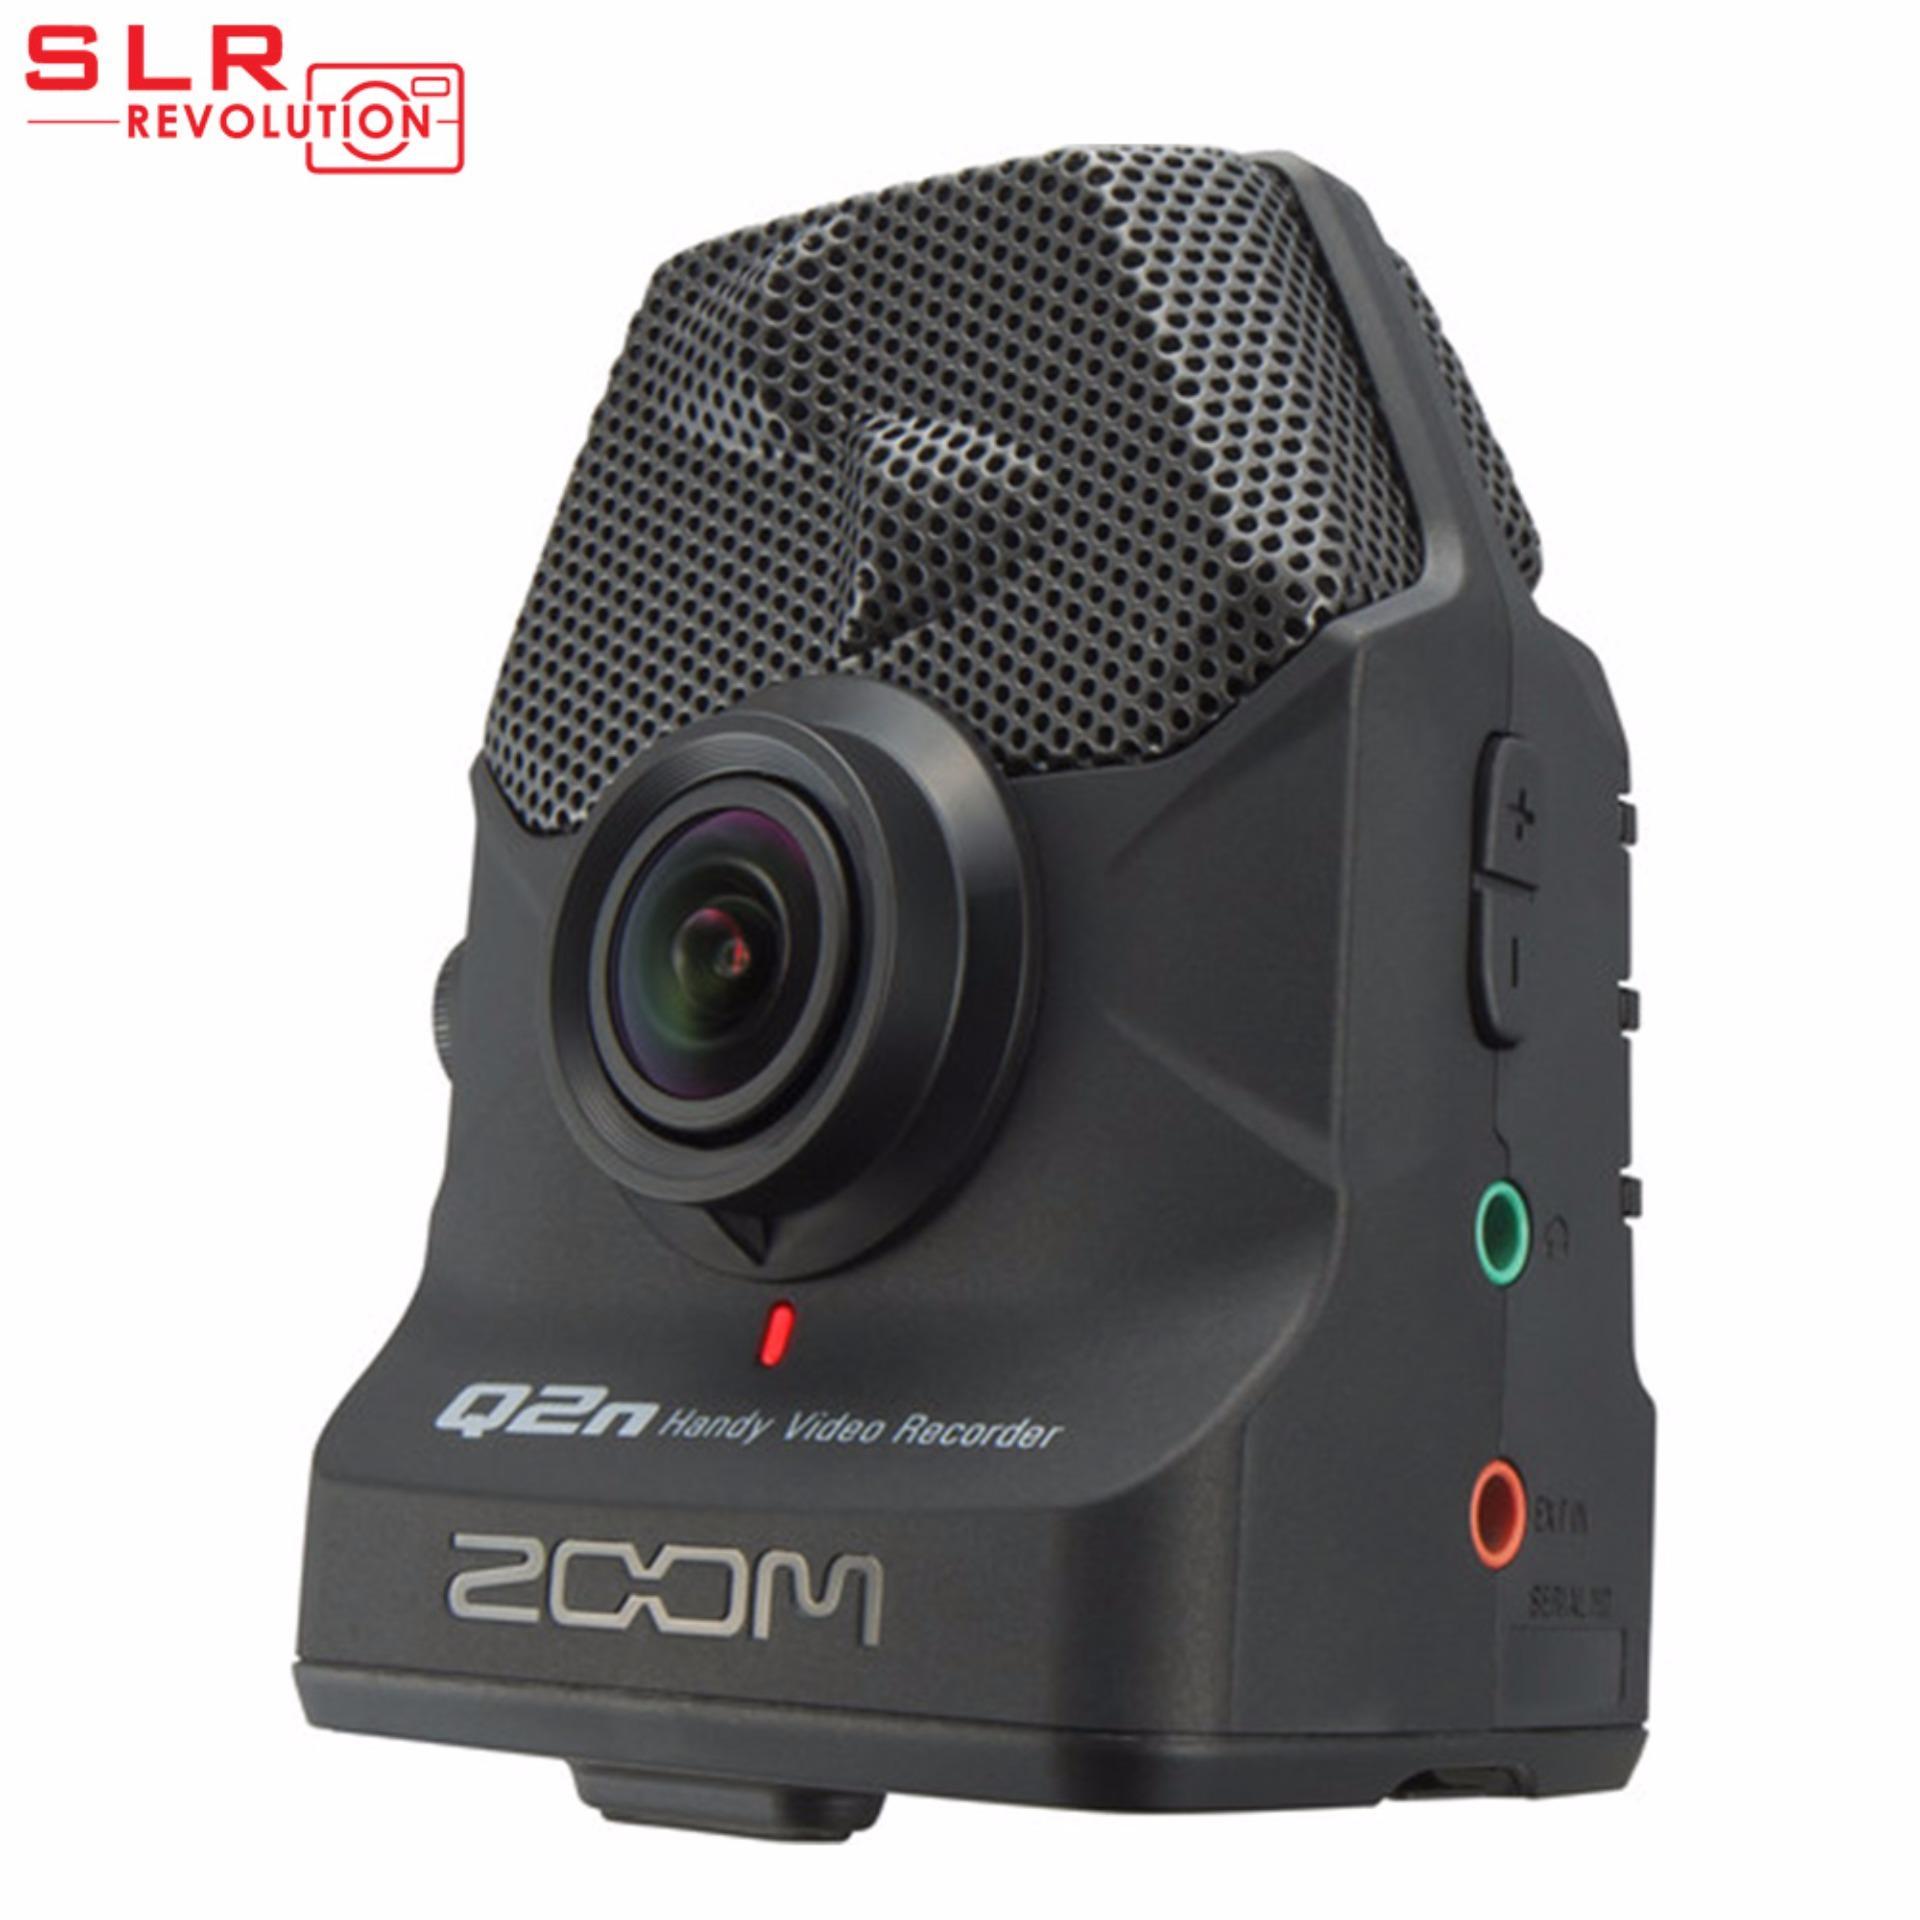 Zoom Q2n Handy Video Recorder (Local Set)